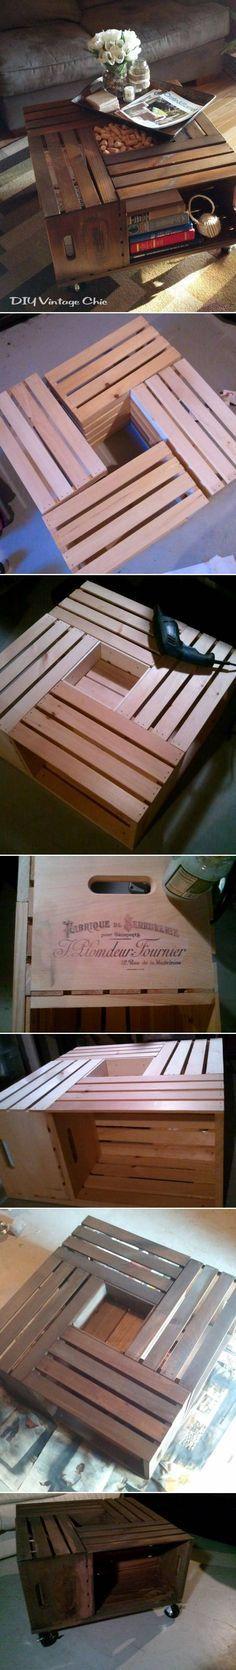 DIY Wine Crate Table ♪ ♪ ... #inspiration_diy GB#diy GB http://www.pinterest.com/gigibrazil/boards/